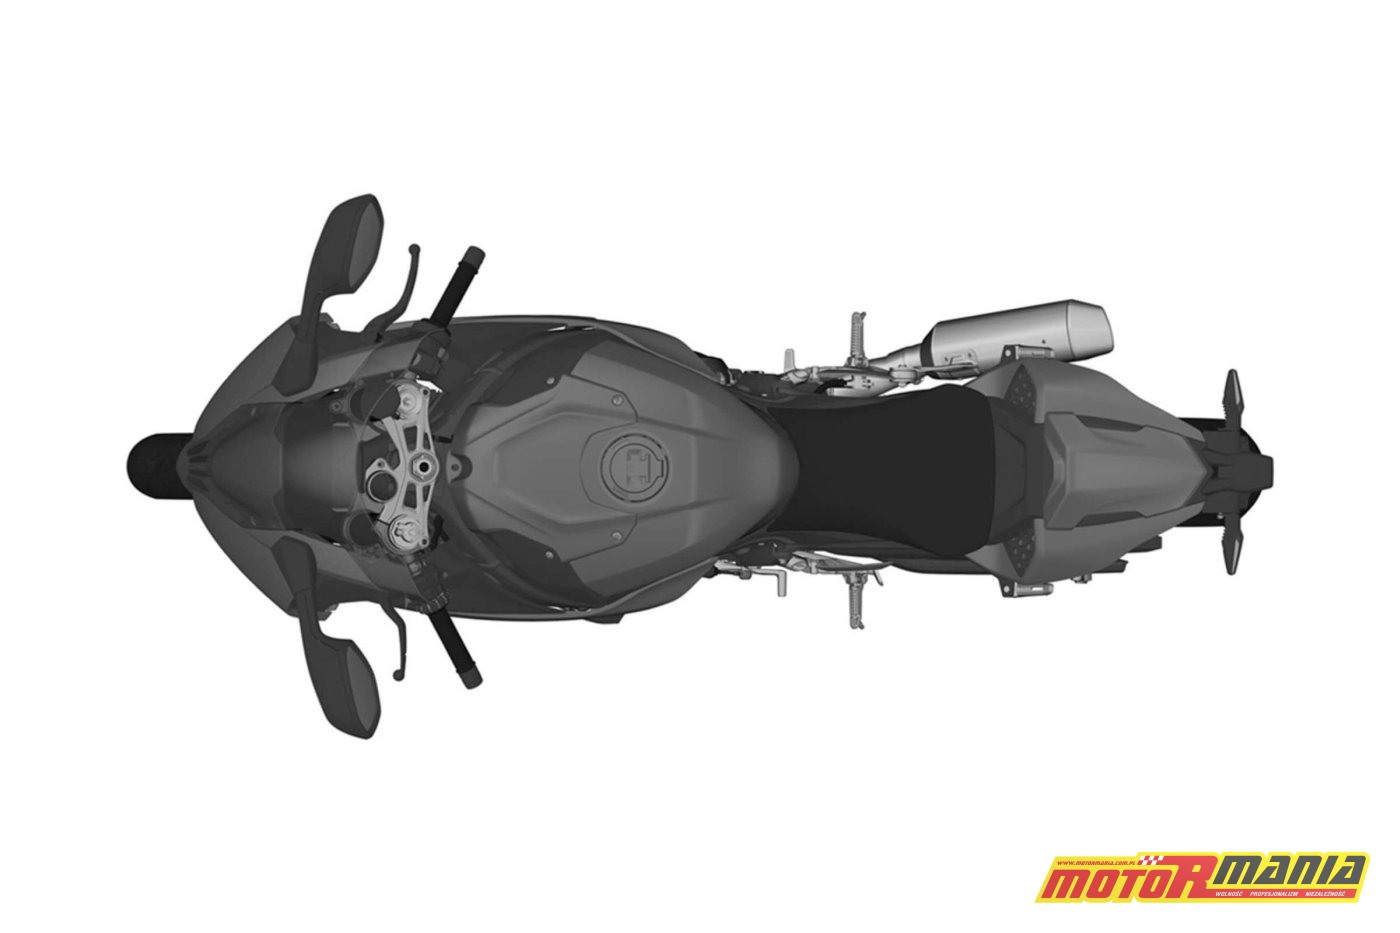 2019 BMW S1000RR rendery patentowe (1)